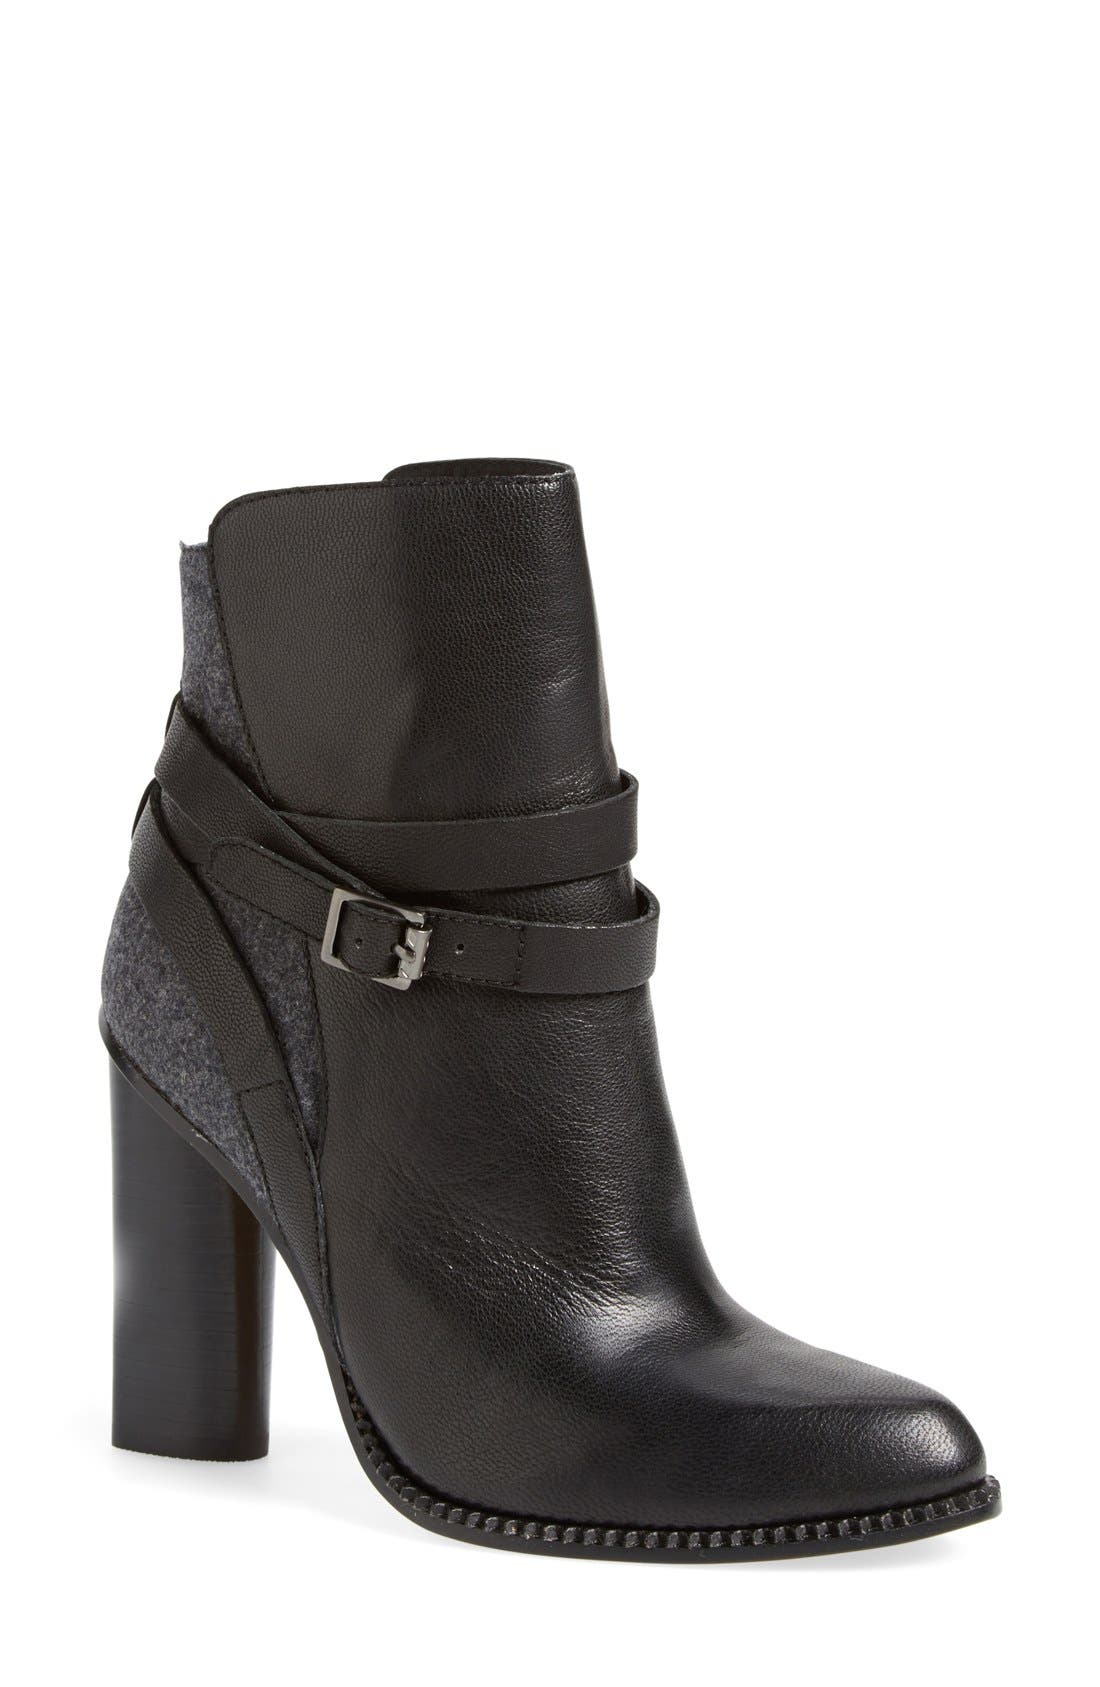 Main Image - Cynthia Vincent 'Hue' Boot (Women)